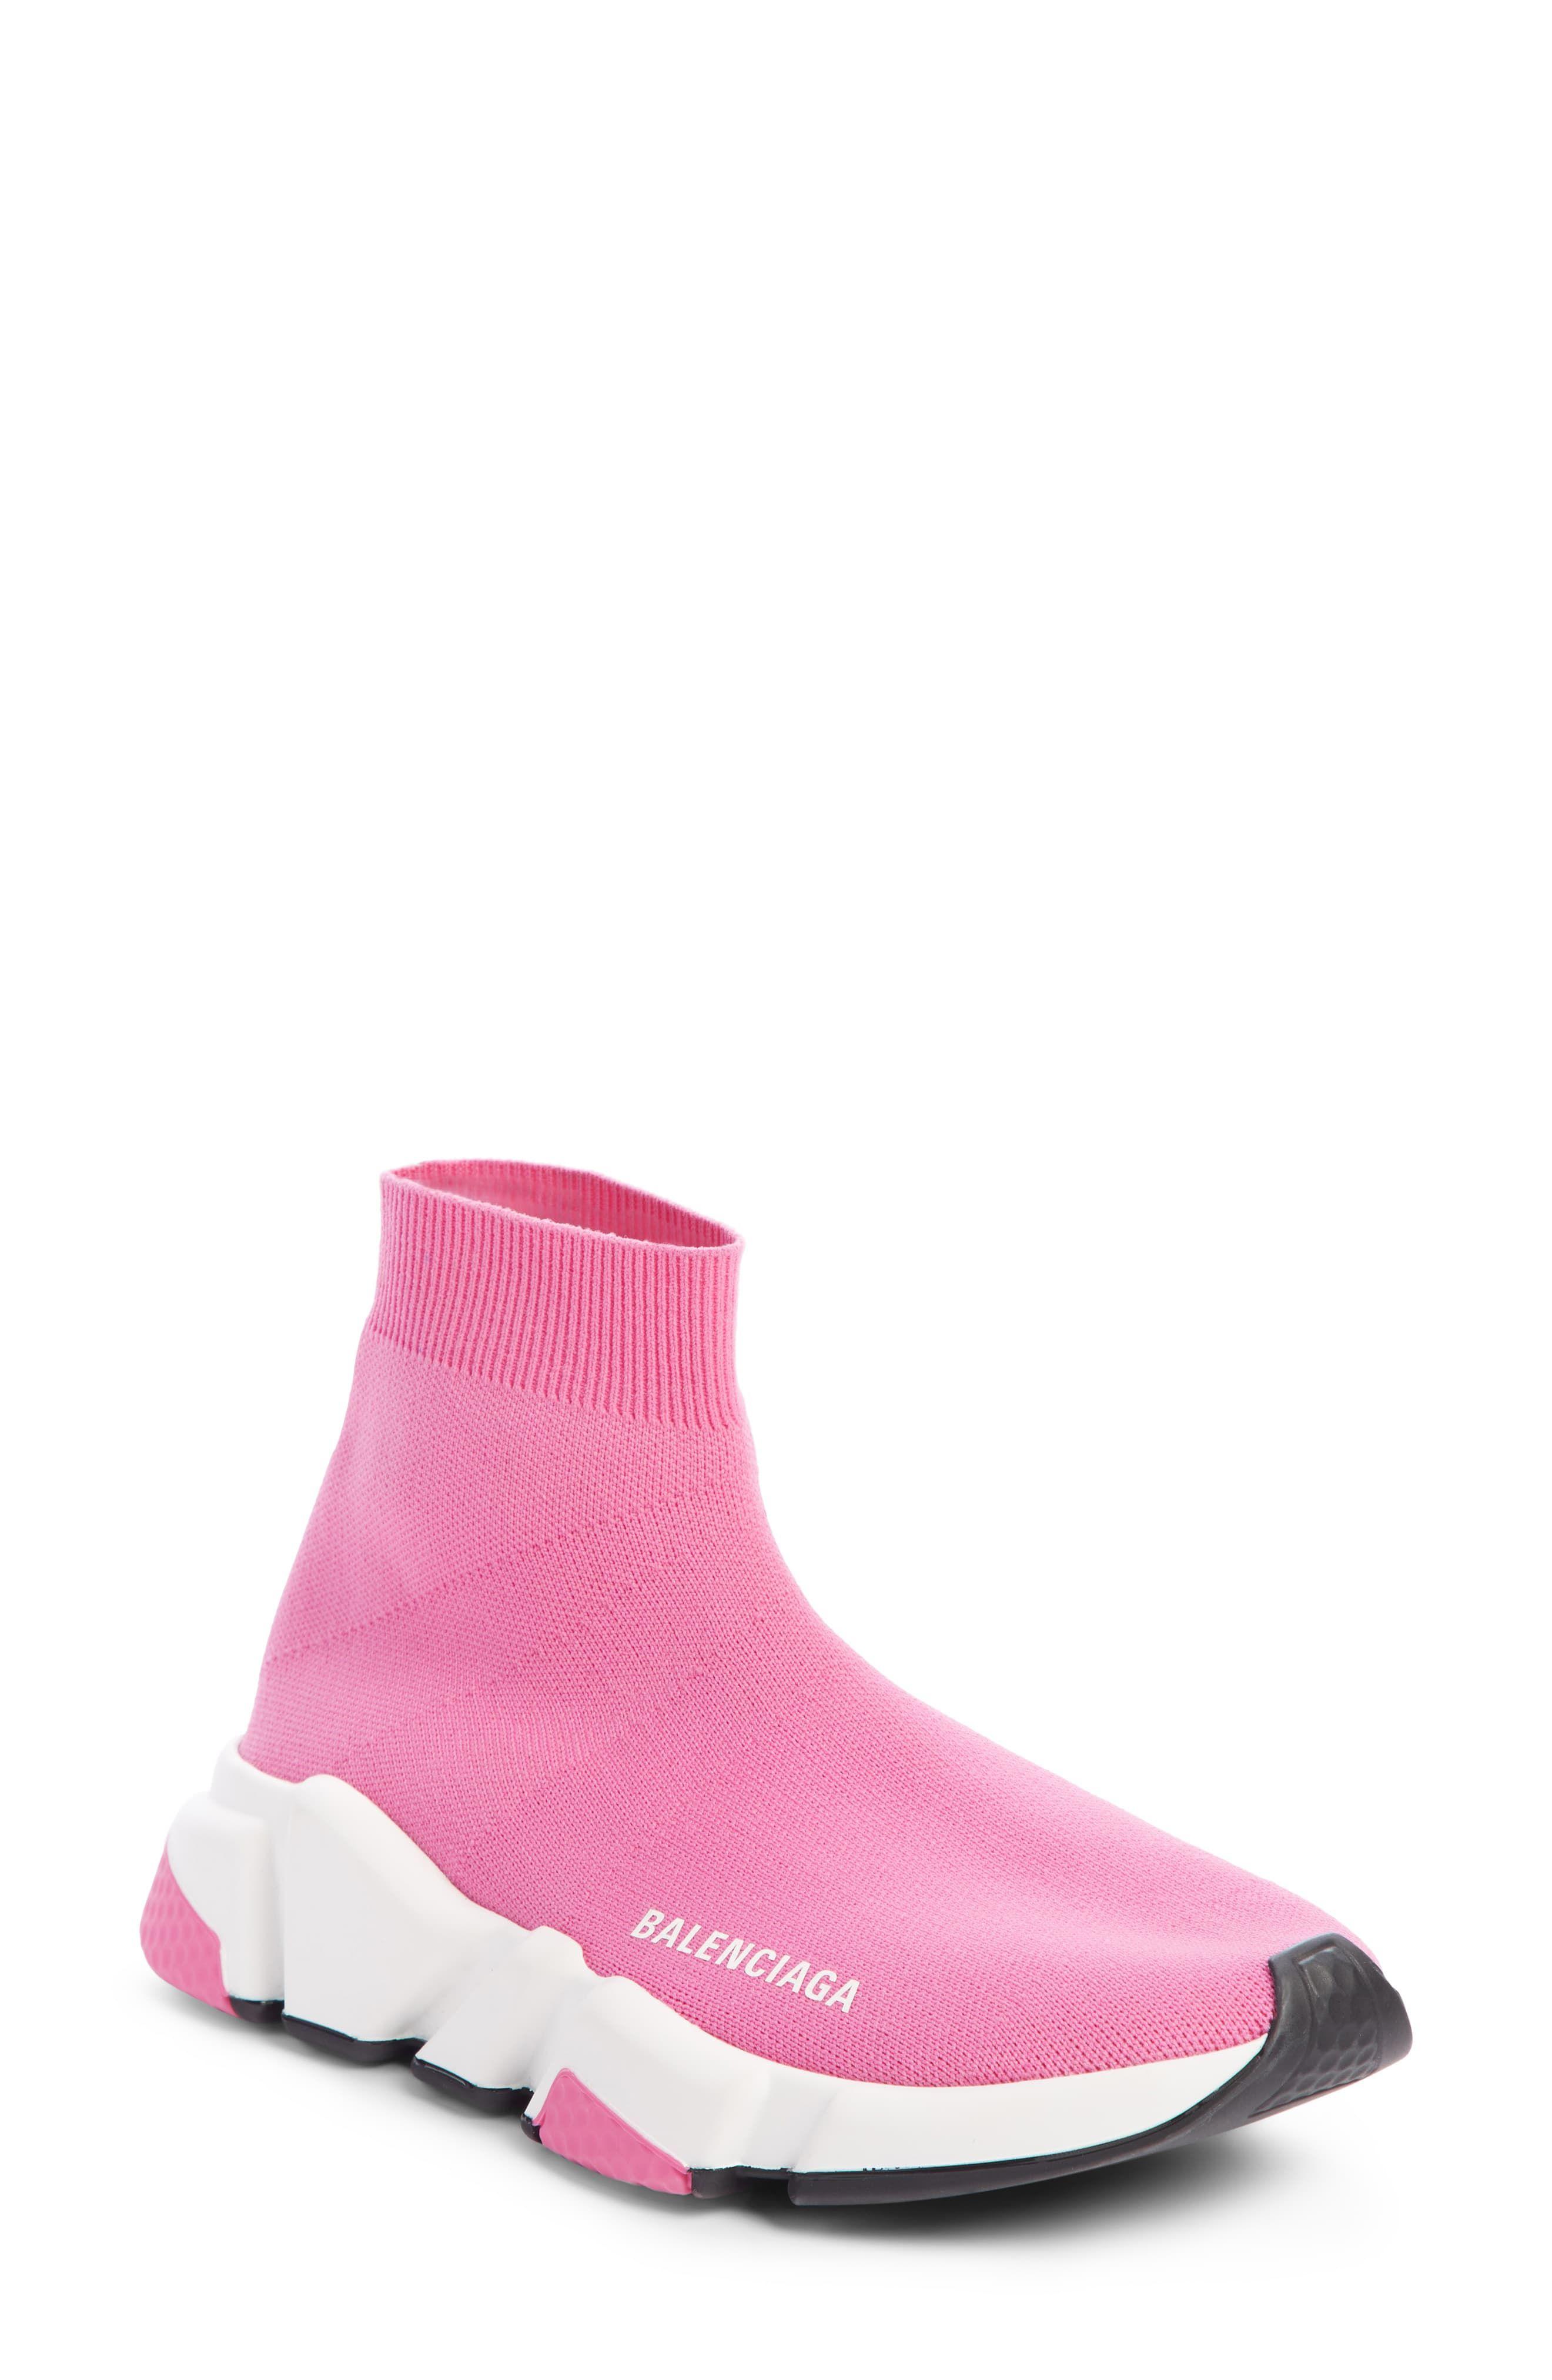 Women's Balenciaga Speed Mid Sneaker